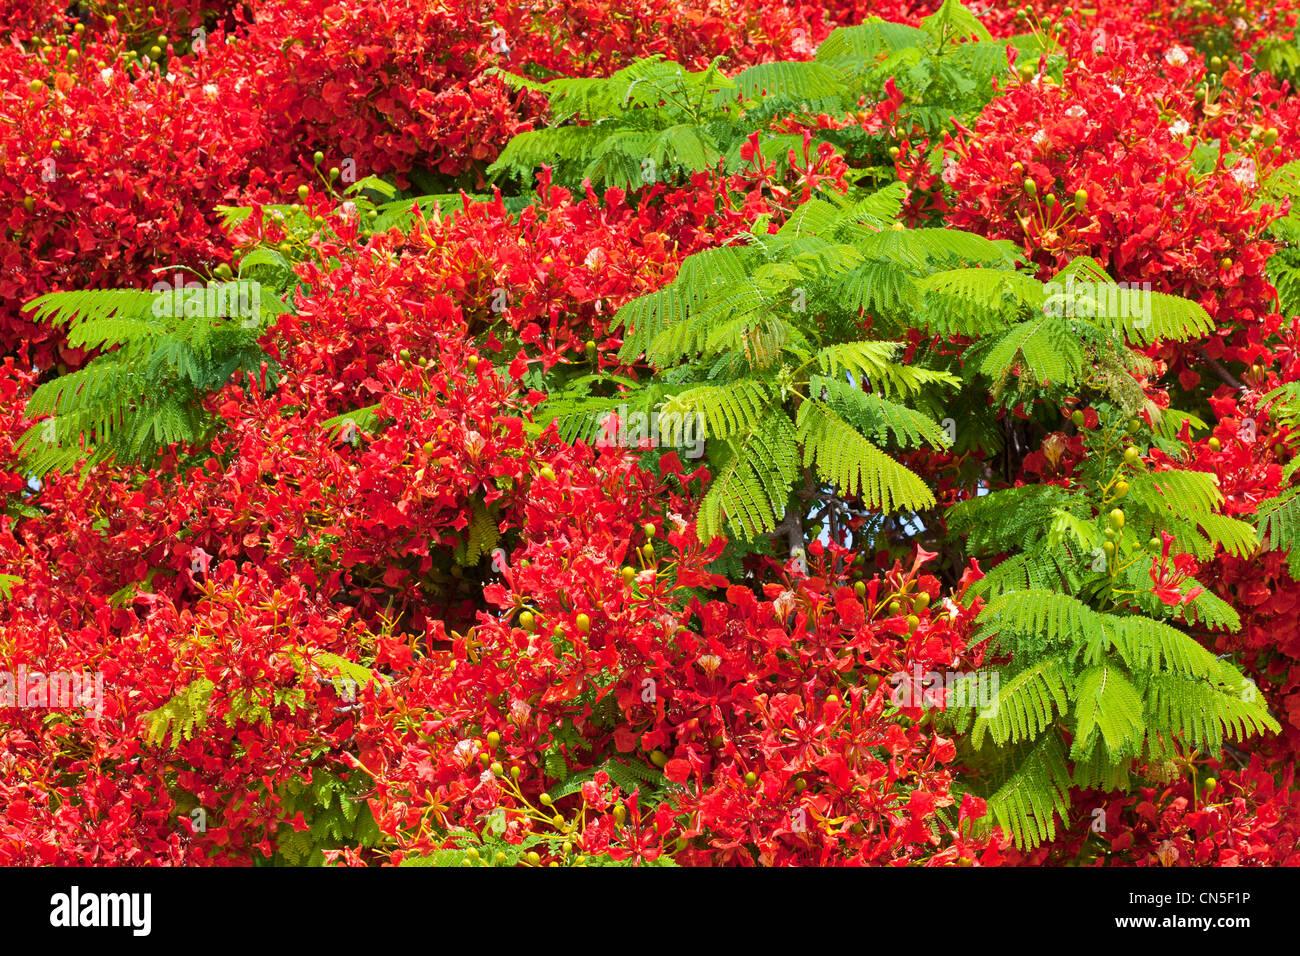 Israel, Tel Aviv, Bot flame tree (delonix regia) blossoming - Stock Image